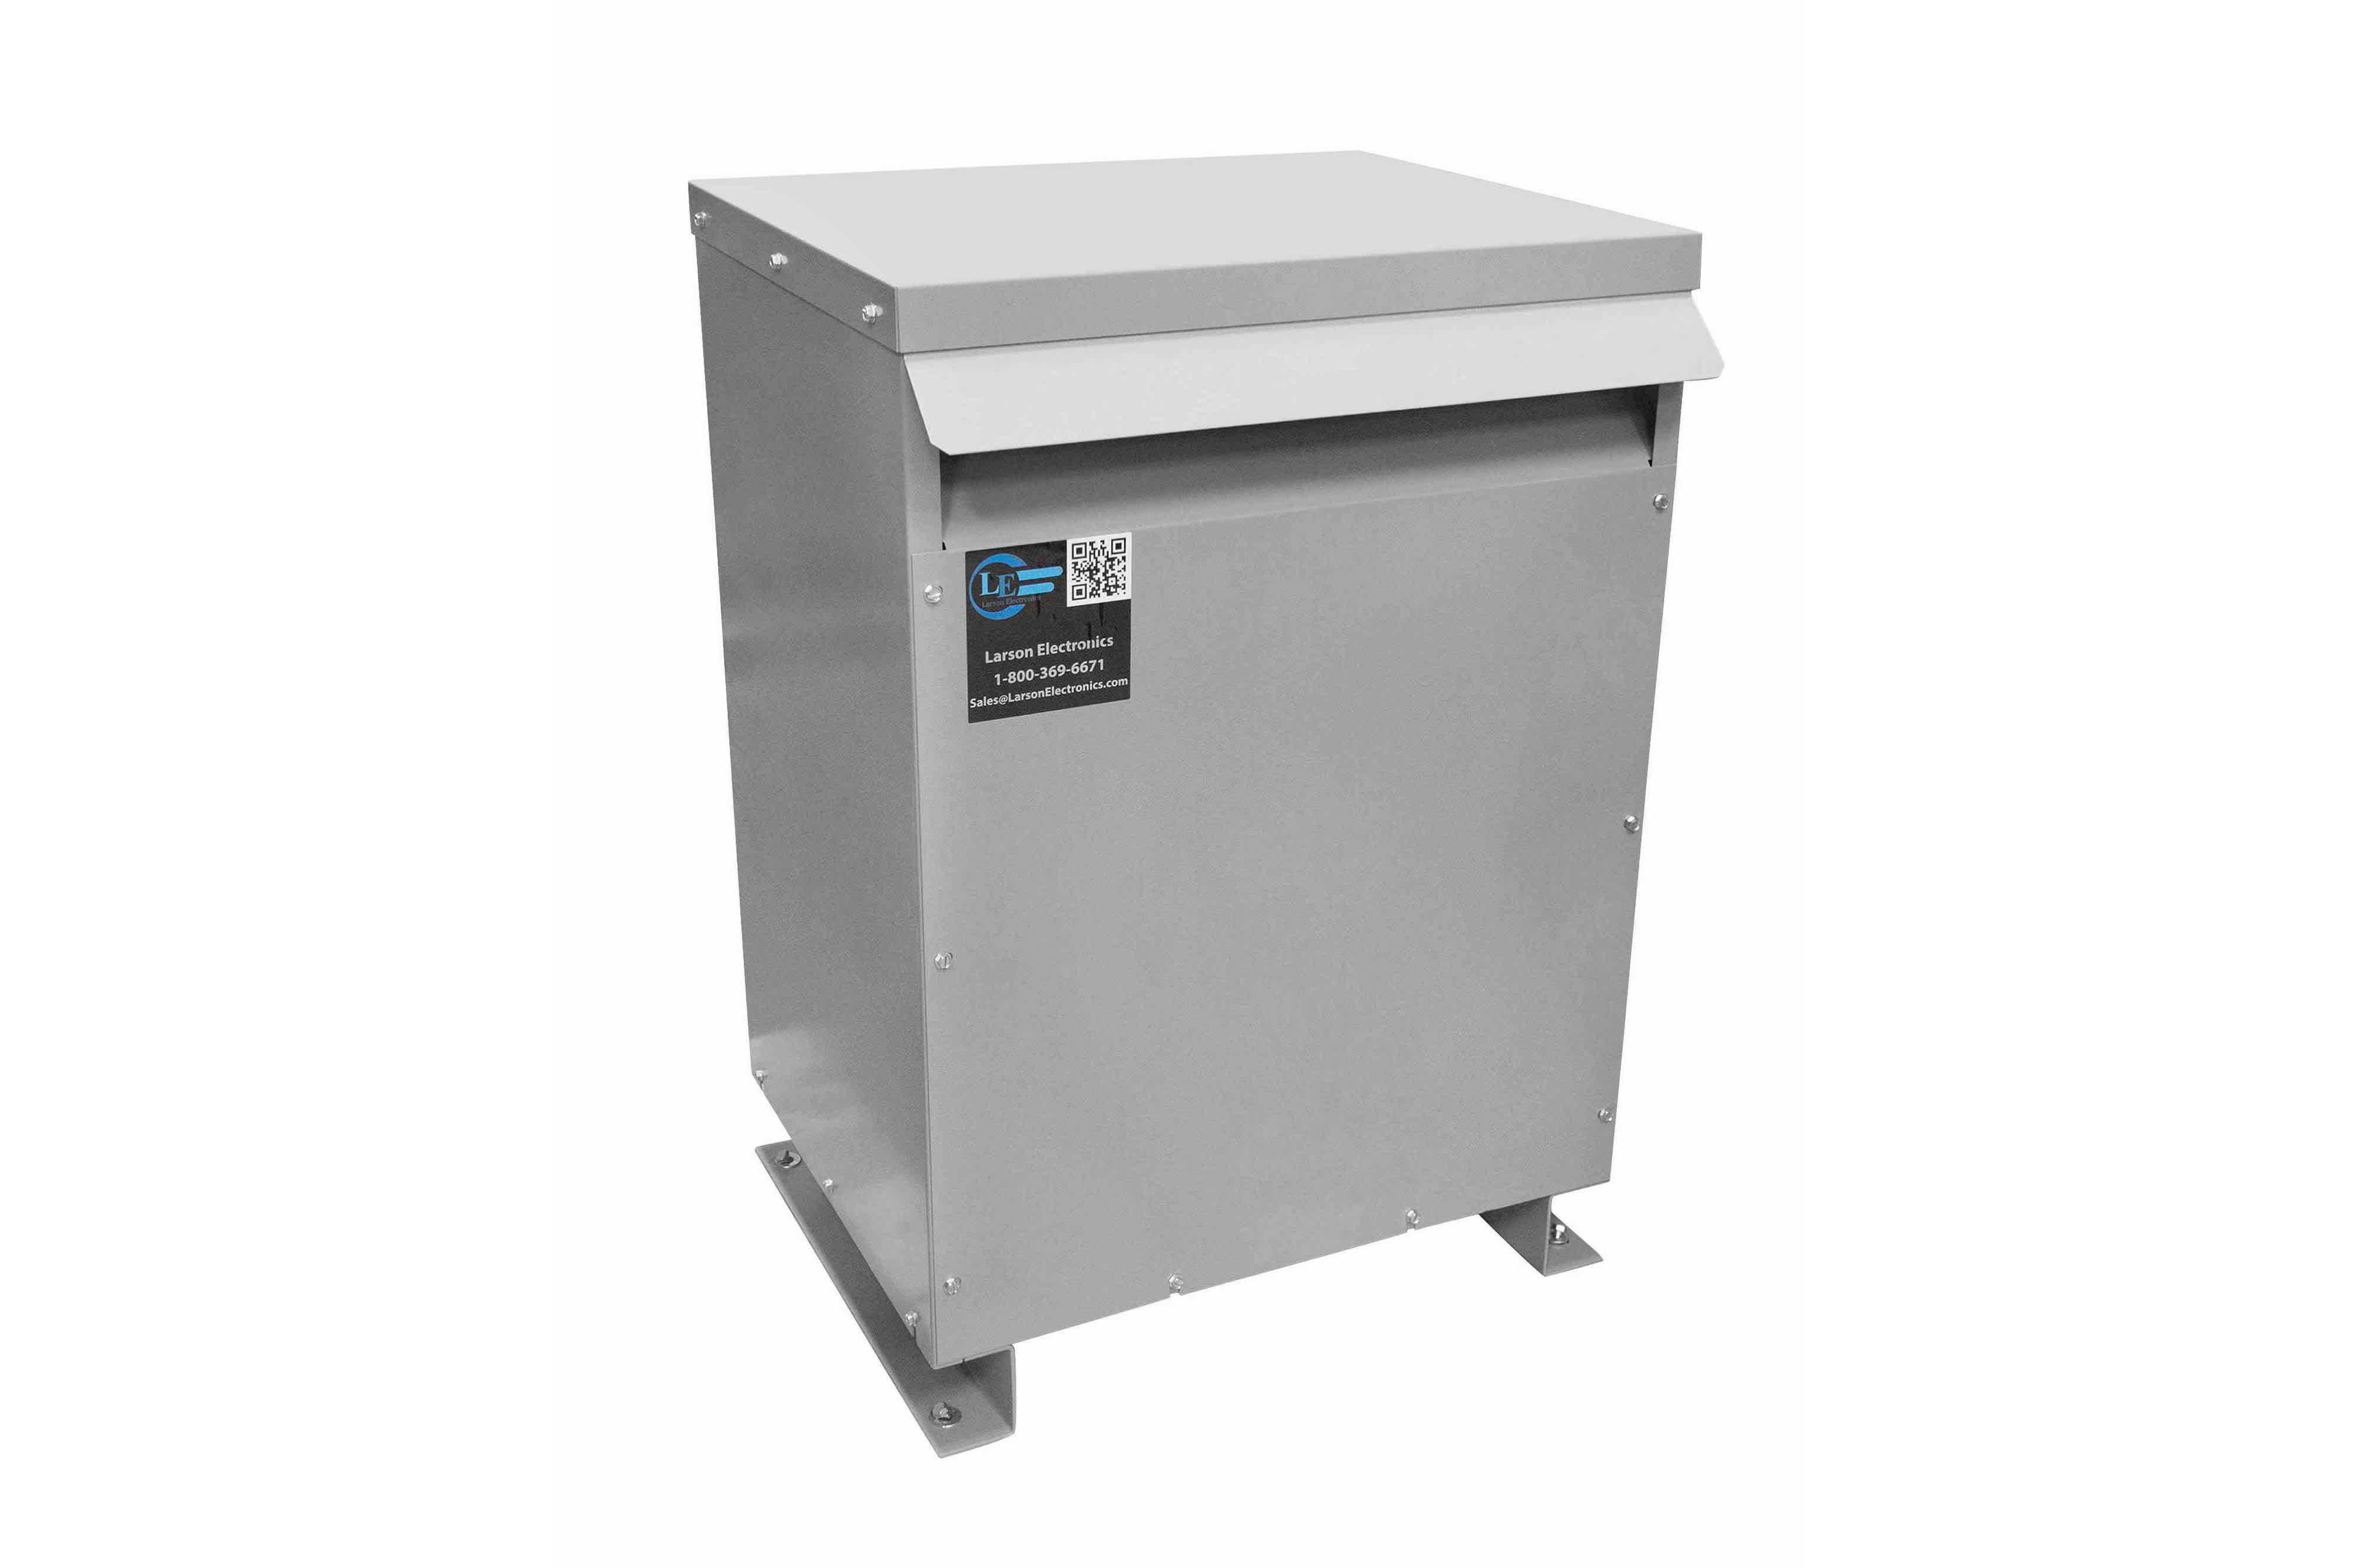 700 kVA 3PH Isolation Transformer, 240V Wye Primary, 480Y/277 Wye-N Secondary, N3R, Ventilated, 60 Hz